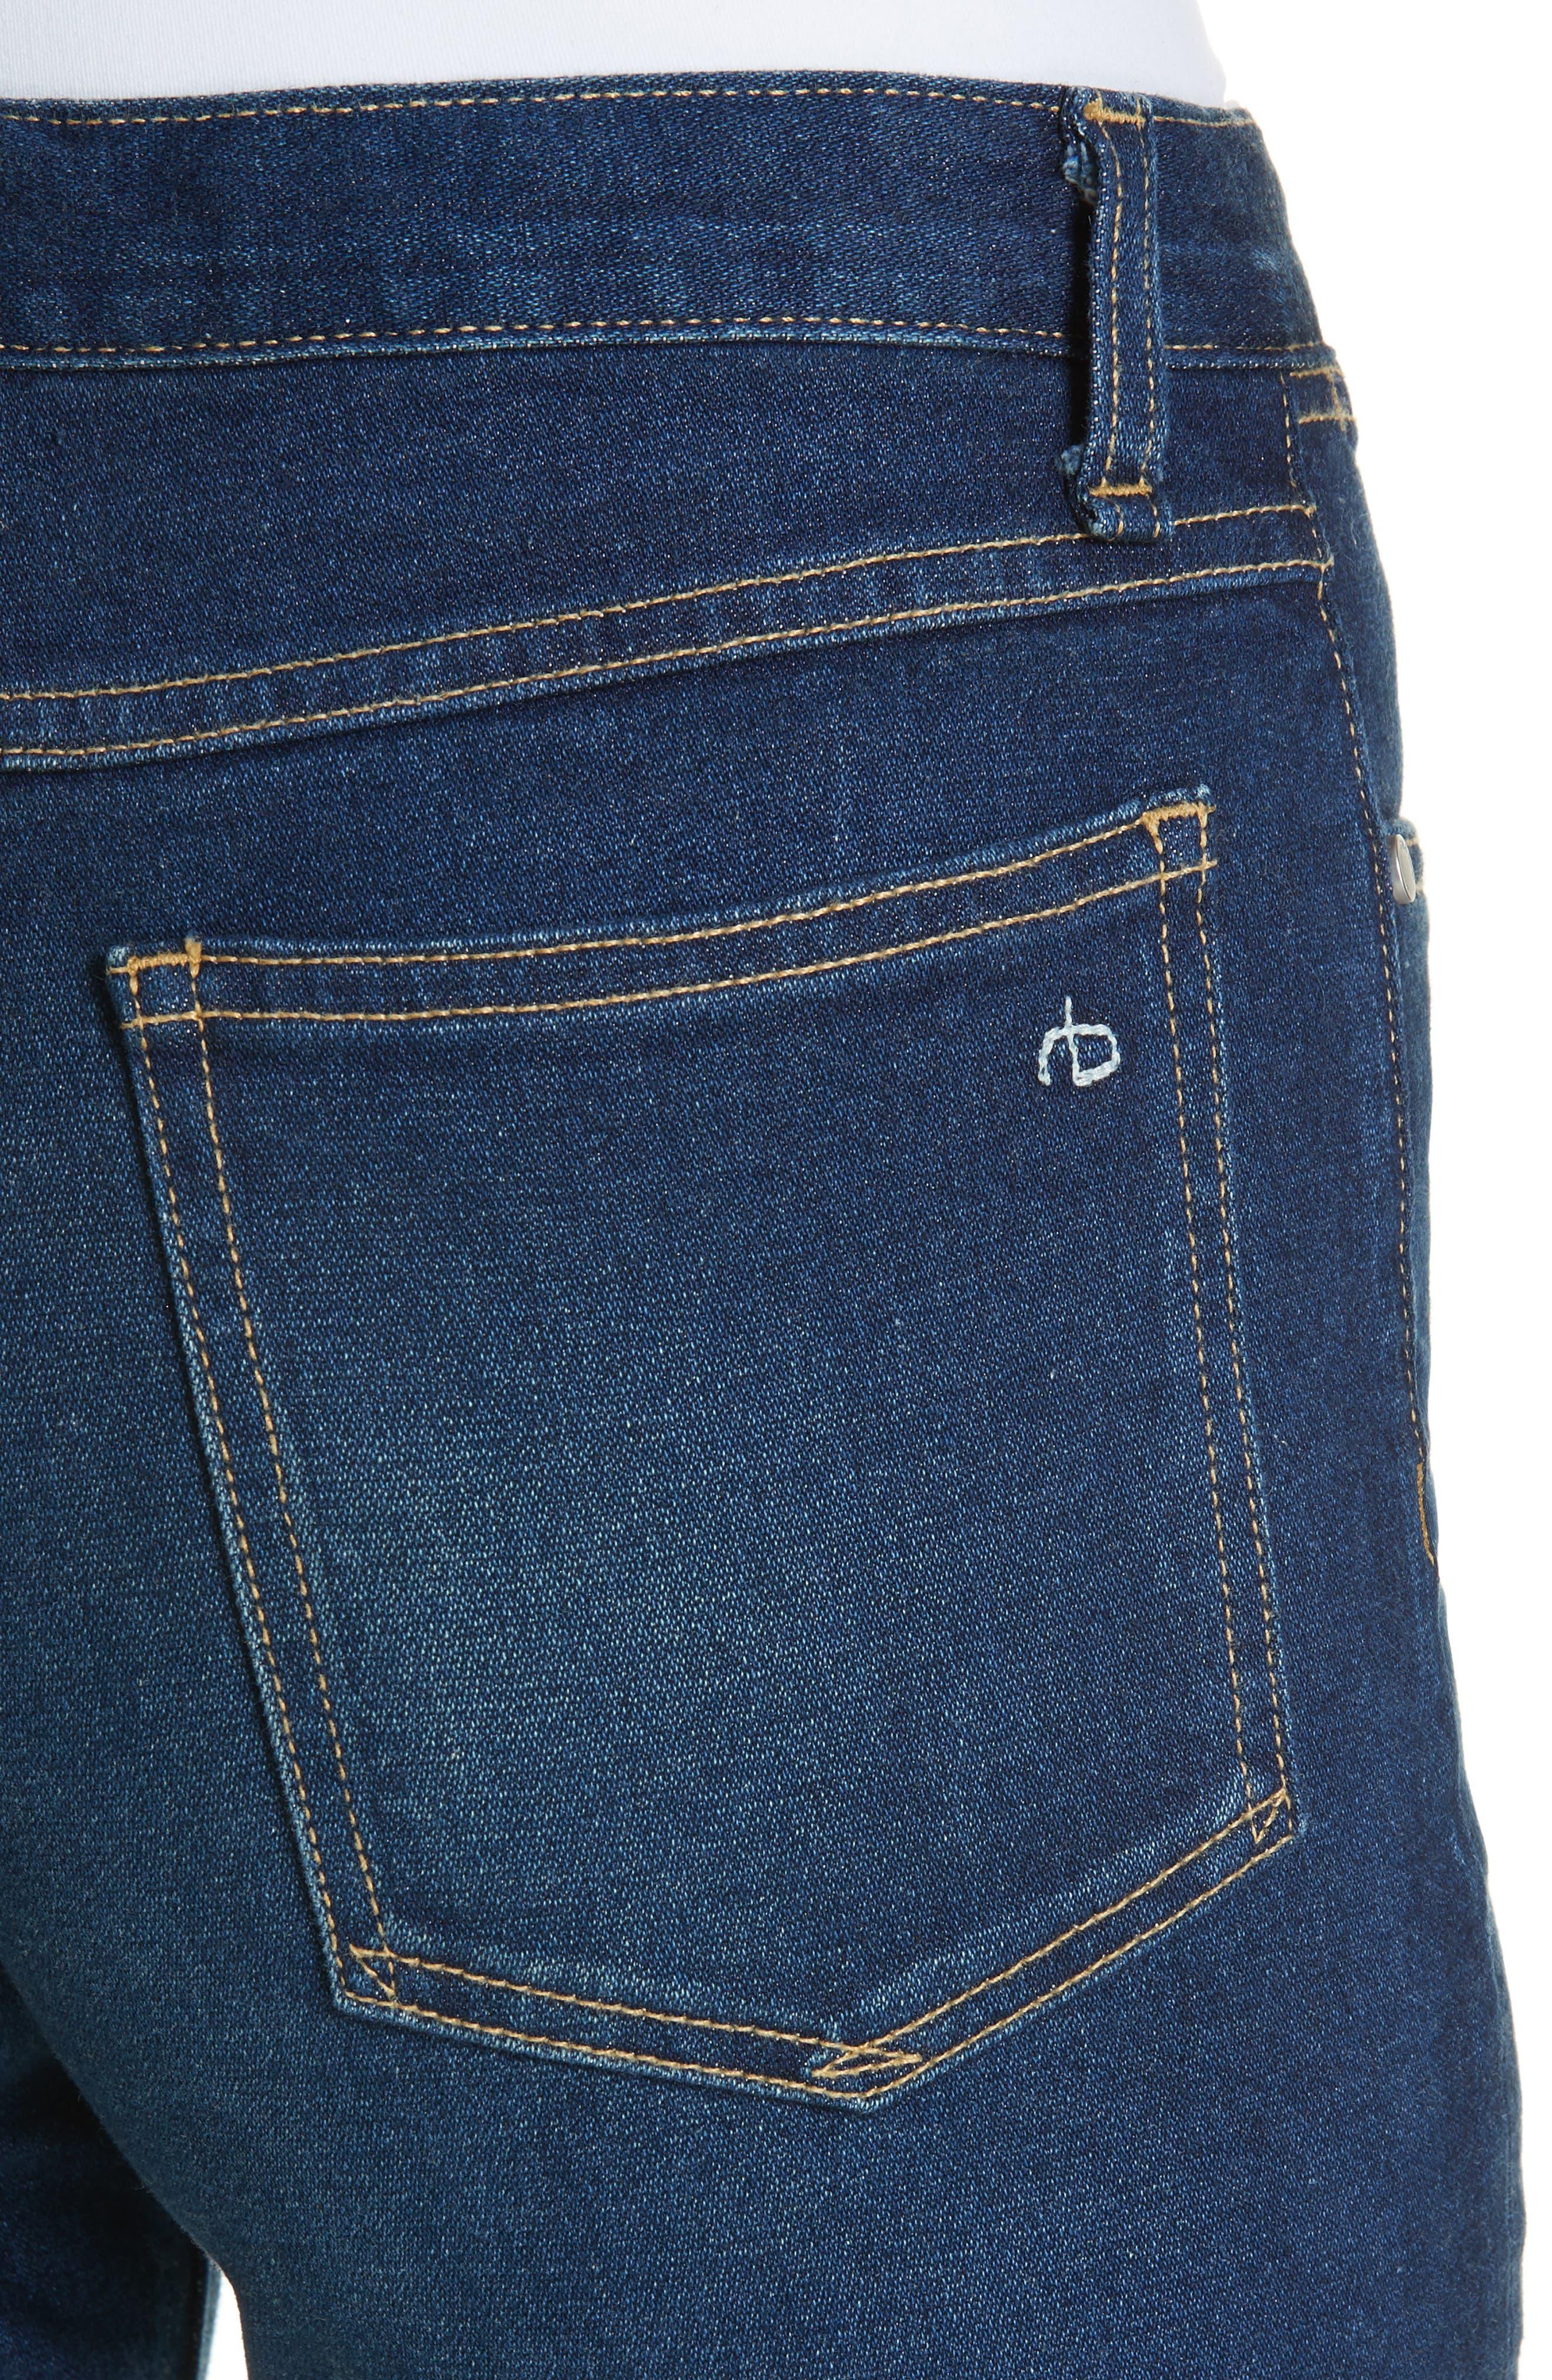 RAG & BONE,                             Justine High Waist Crop Wide Leg Jeans,                             Alternate thumbnail 4, color,                             410